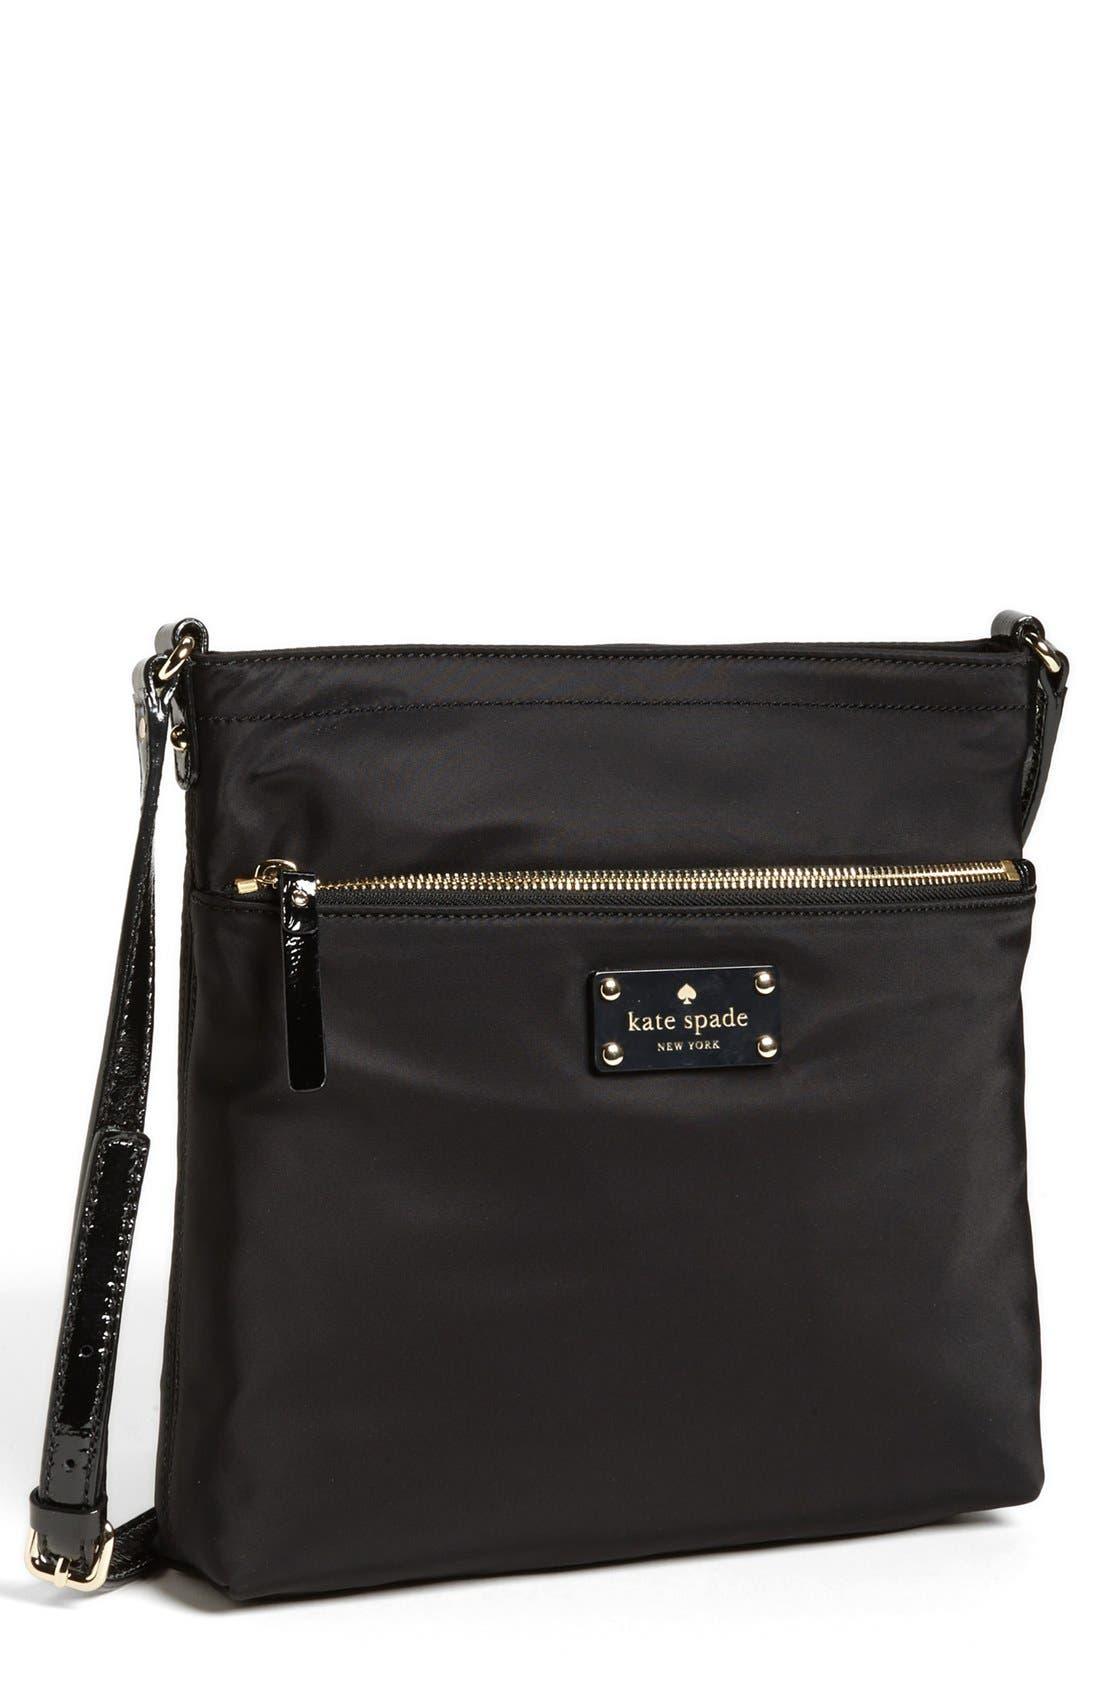 Main Image - kate spade new york 'jan' nylon crossbody bag